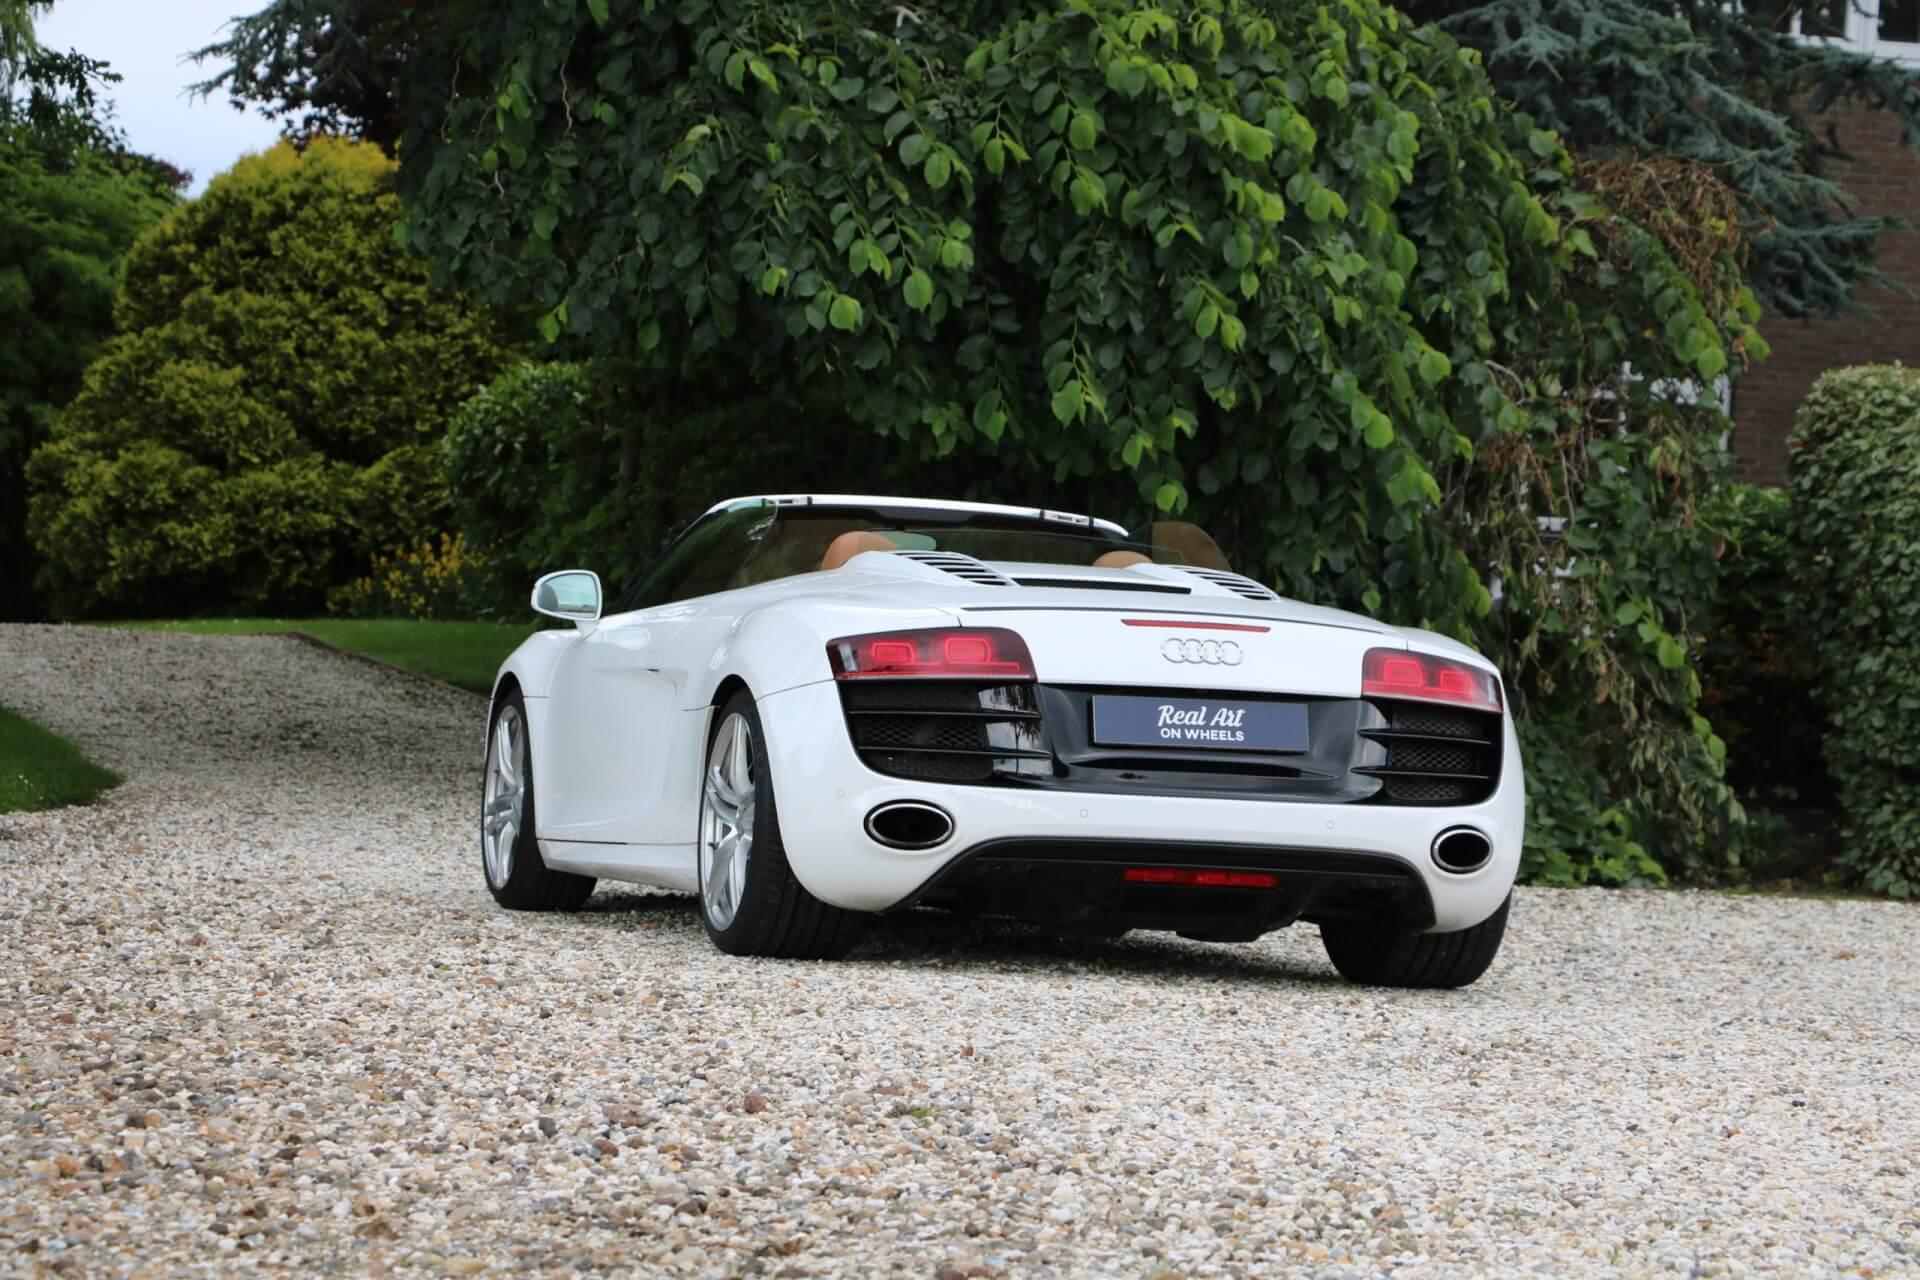 Real Art on Wheels | 2010 Audi R8 Spyder V10